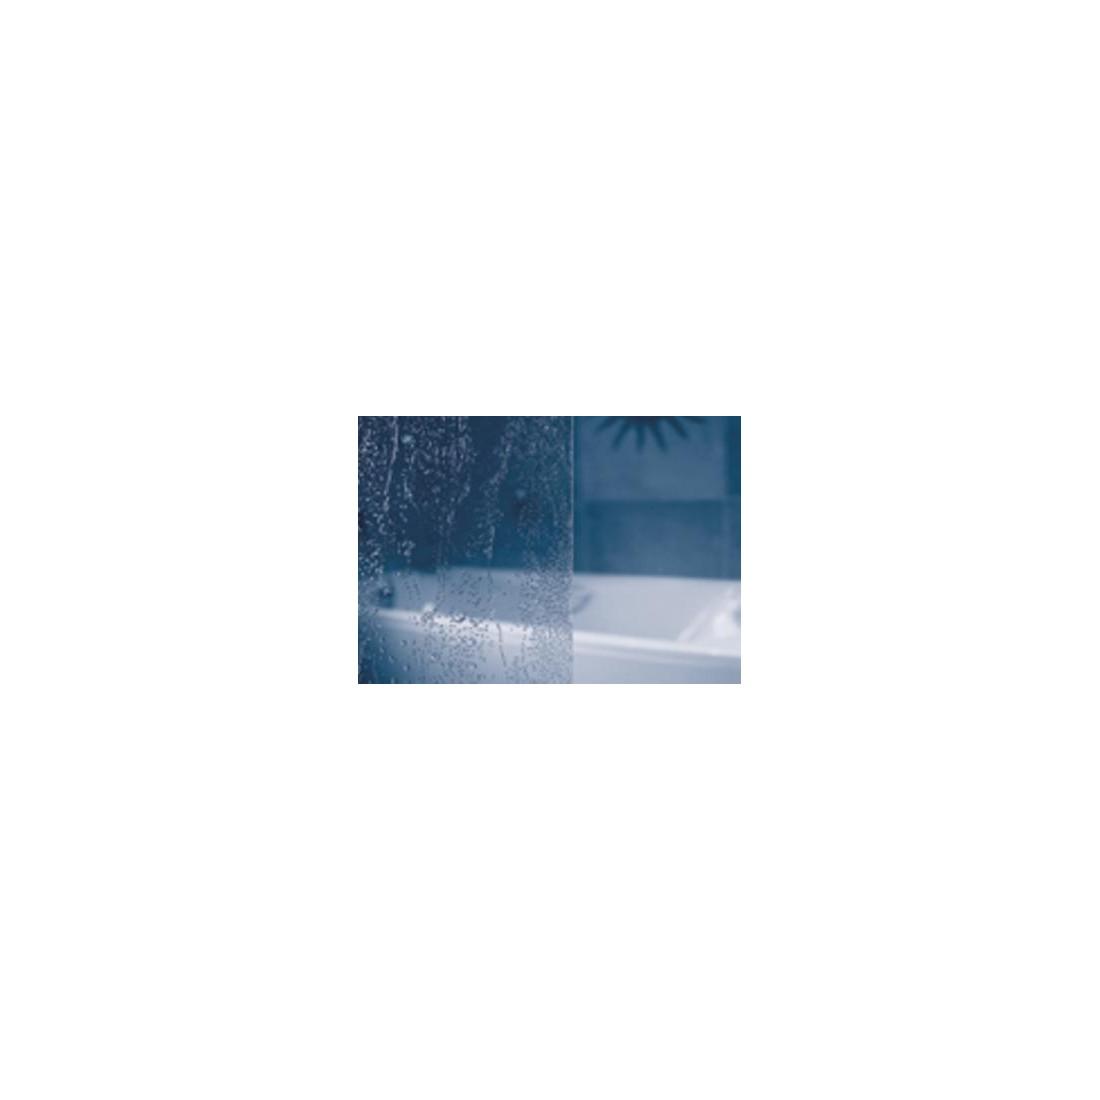 Vonios sienelė VSK2 ROSA 140R POLYESTER RAIN